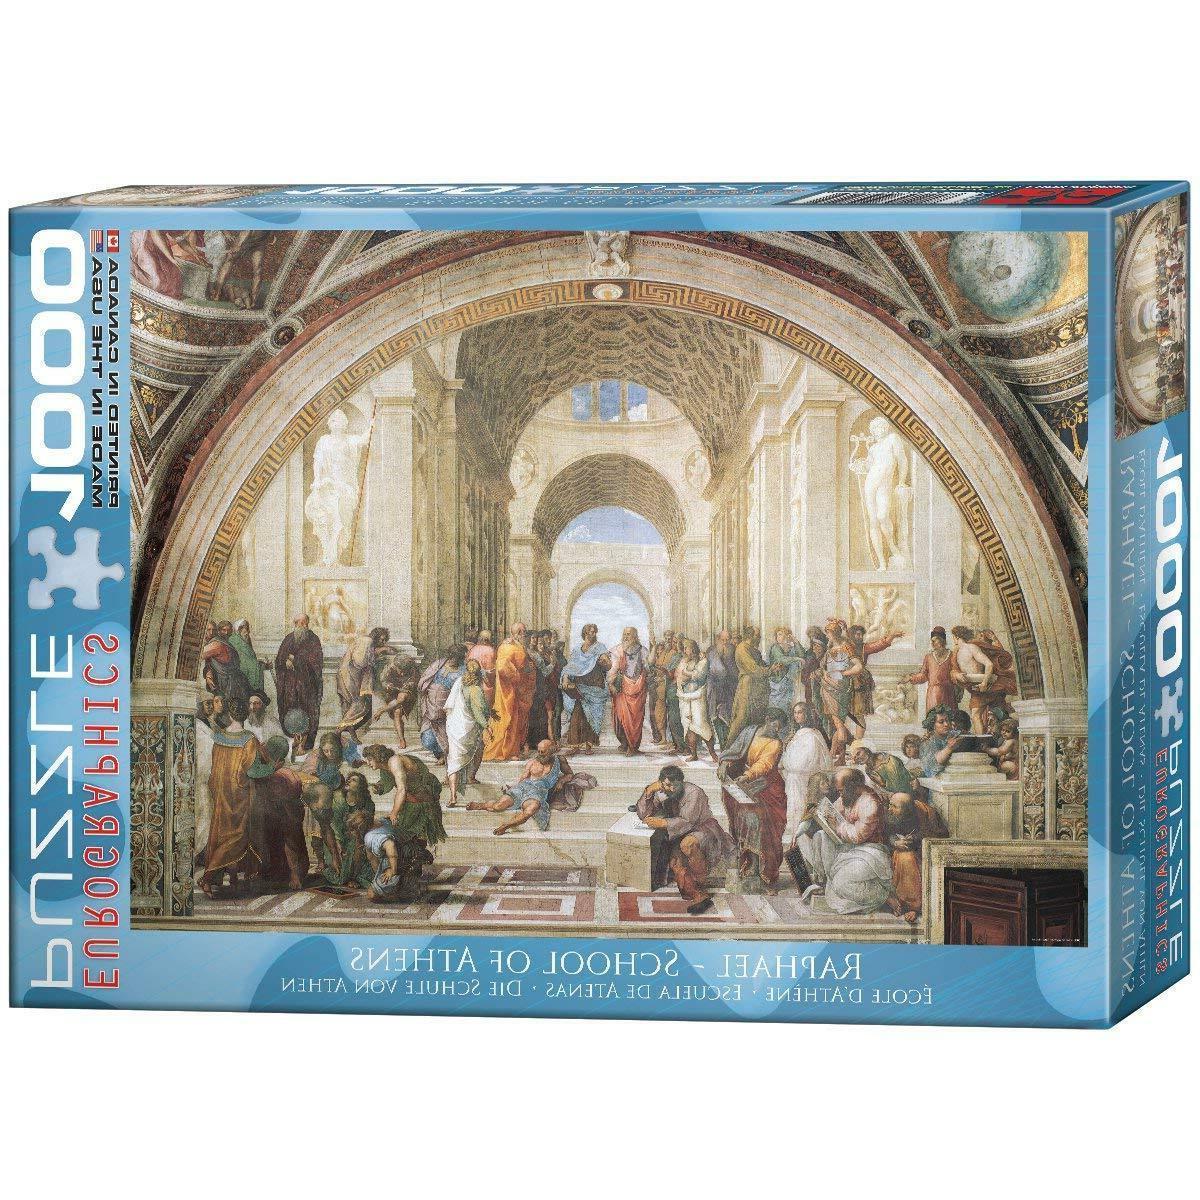 Raphael JIGSAW PUZZLE EG60004141 Eurographics Puzzle 1000 Pc  School of Athens